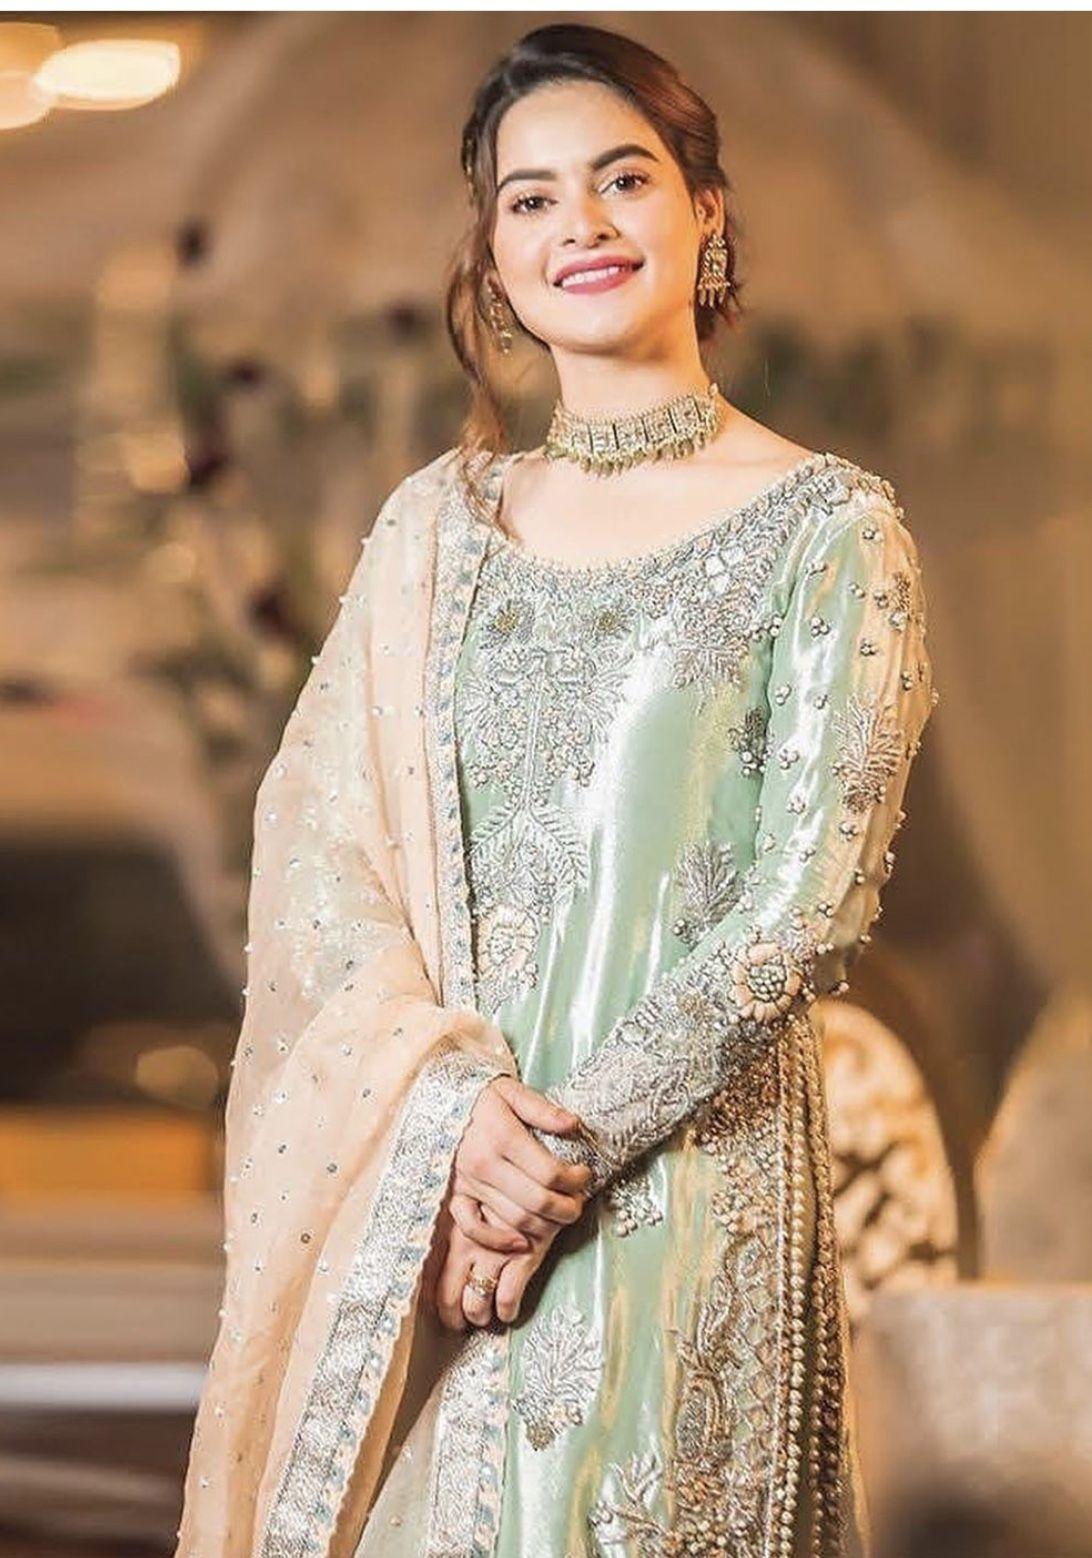 Baat Pakki Engagement Bride Dress Inspo In 2020 Pakistani Bridal Wear Fancy Dresses Pakistani Bridal Dresses,Traditional Indian Wedding Guest Dresses For Girls